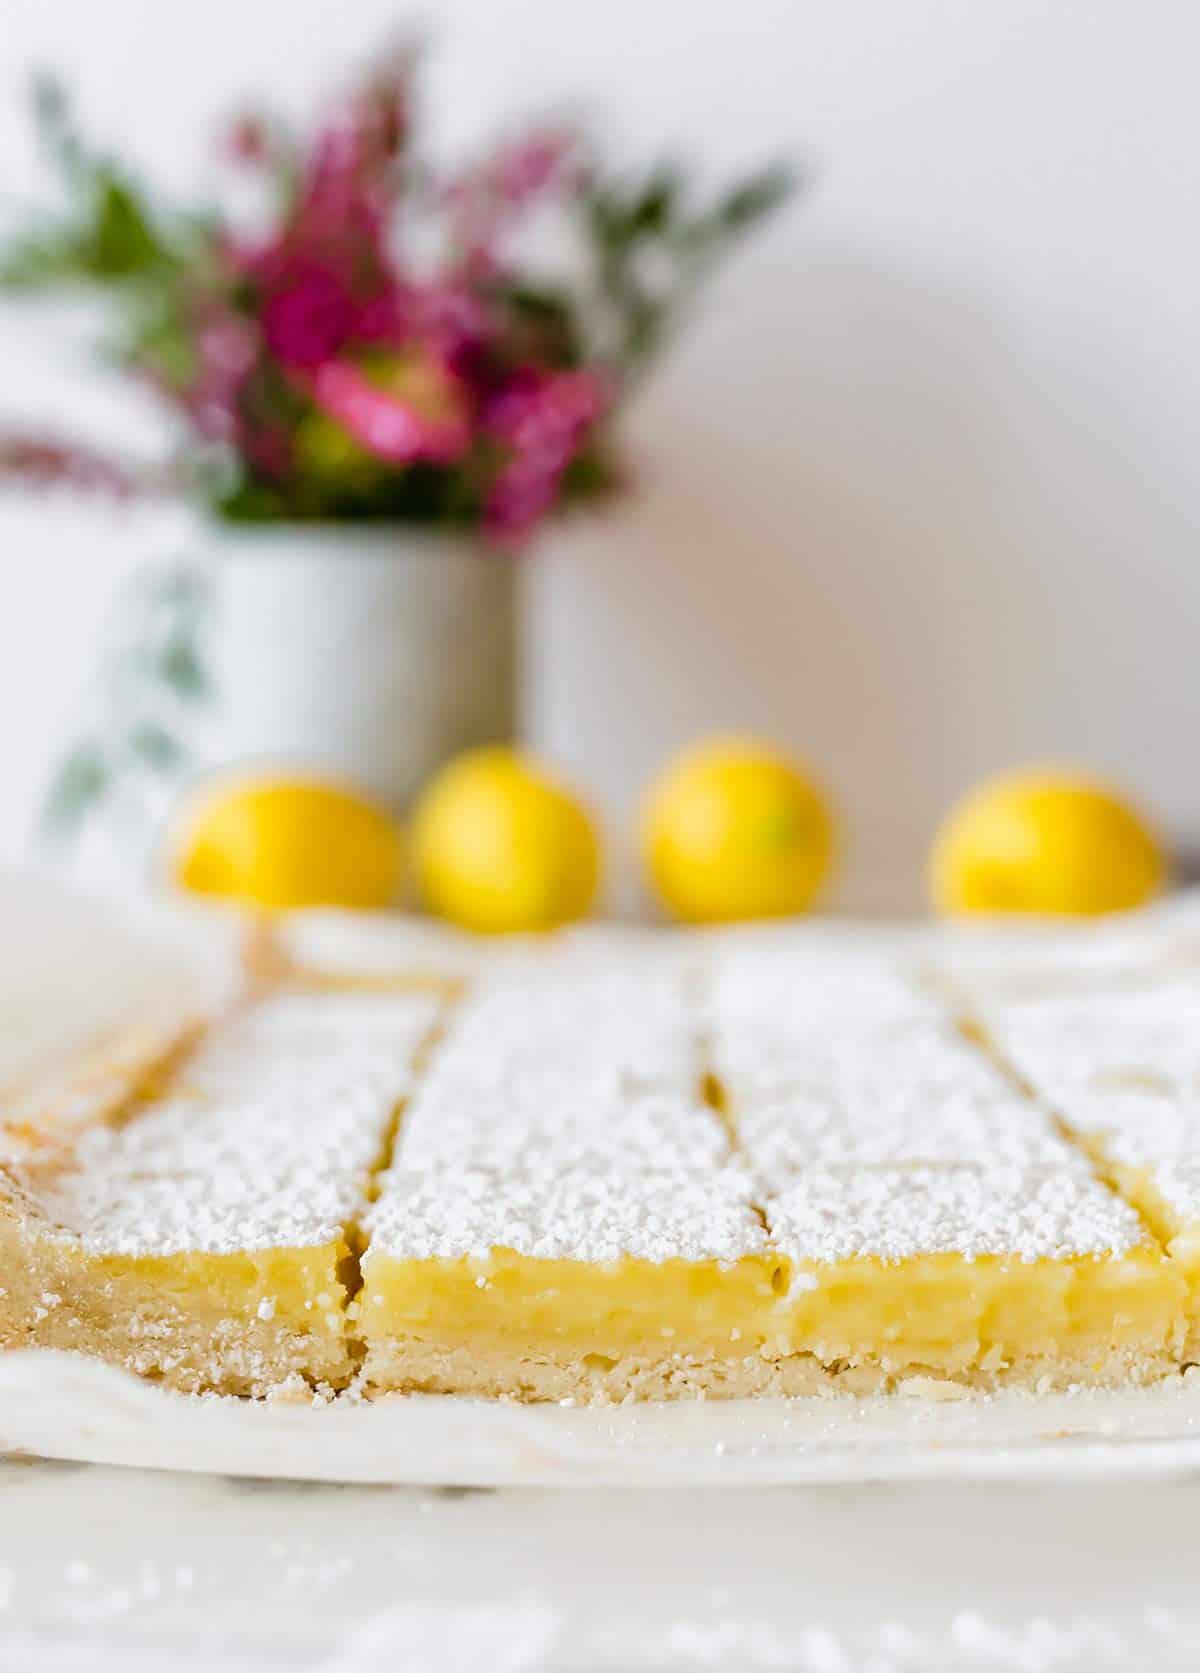 Lemon bars sliced into squares on a piece of parchment paper.